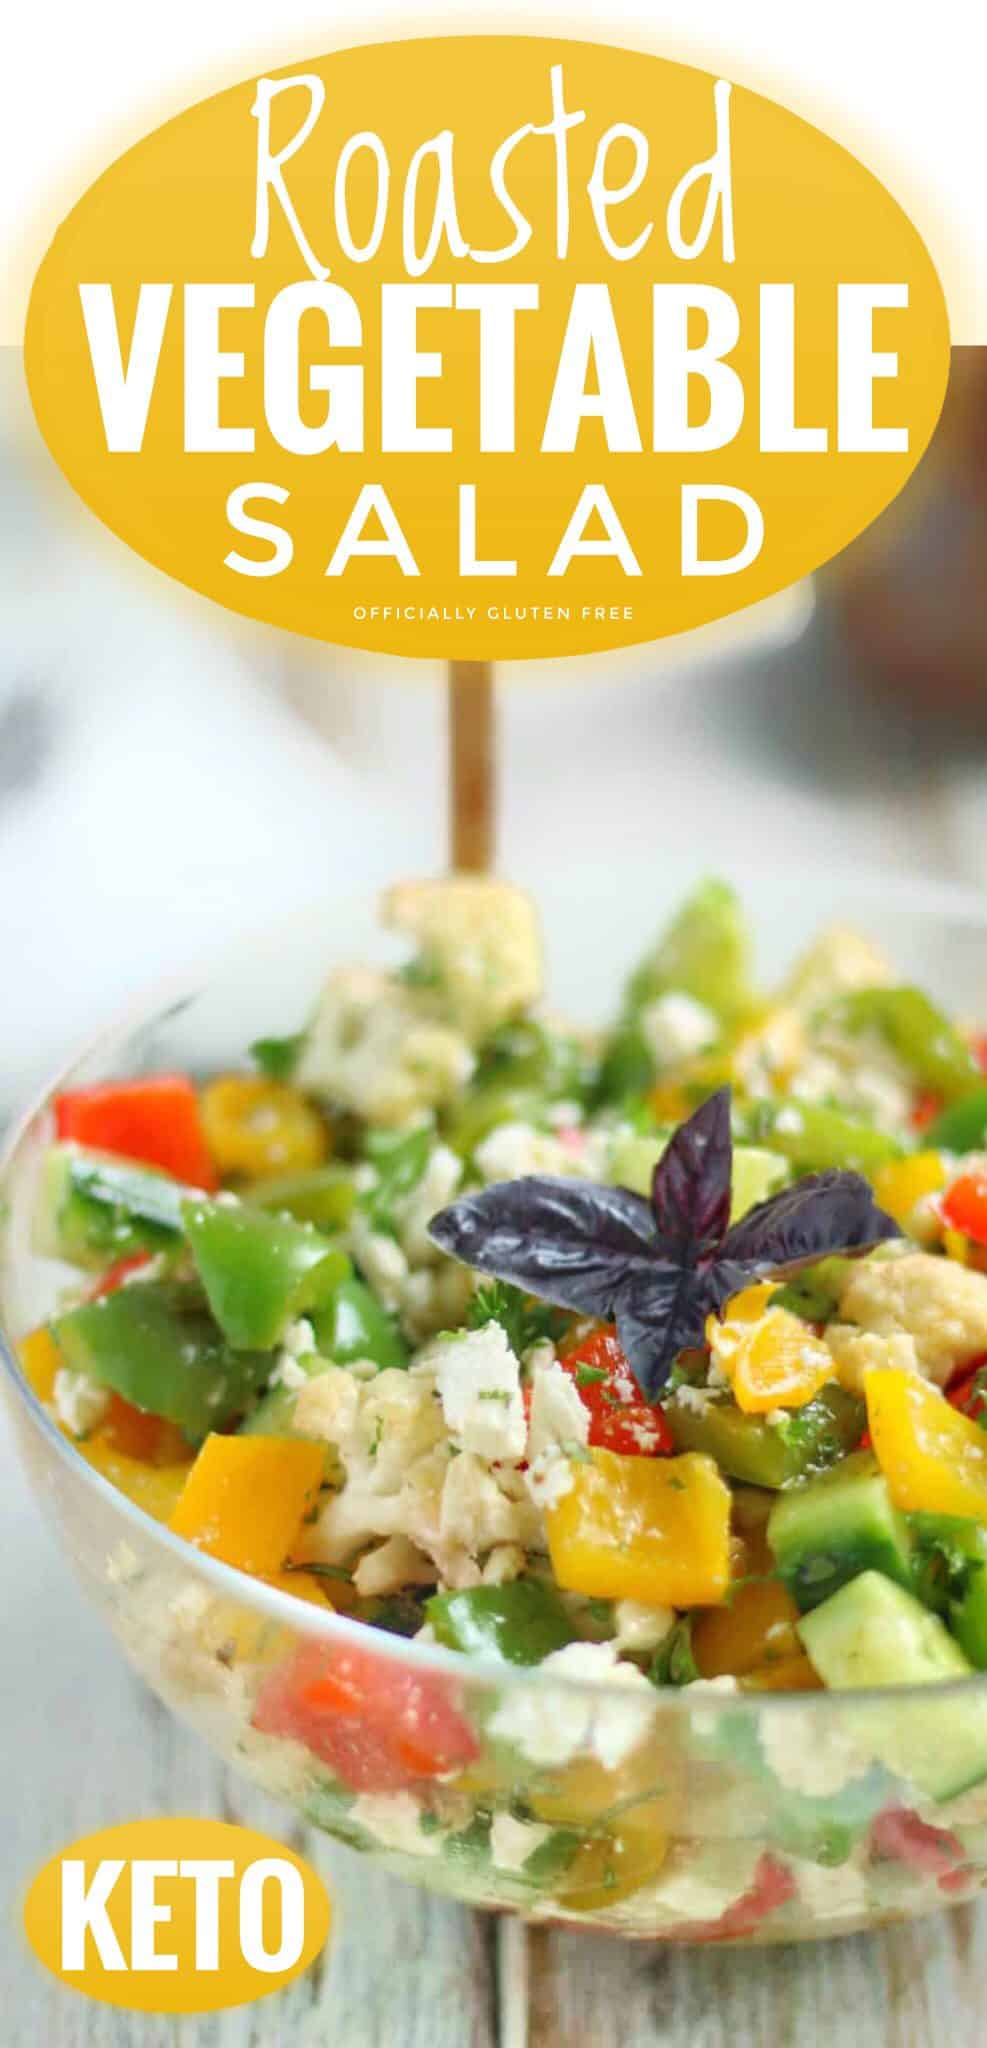 Low Carb Roasted Vegetable Salad